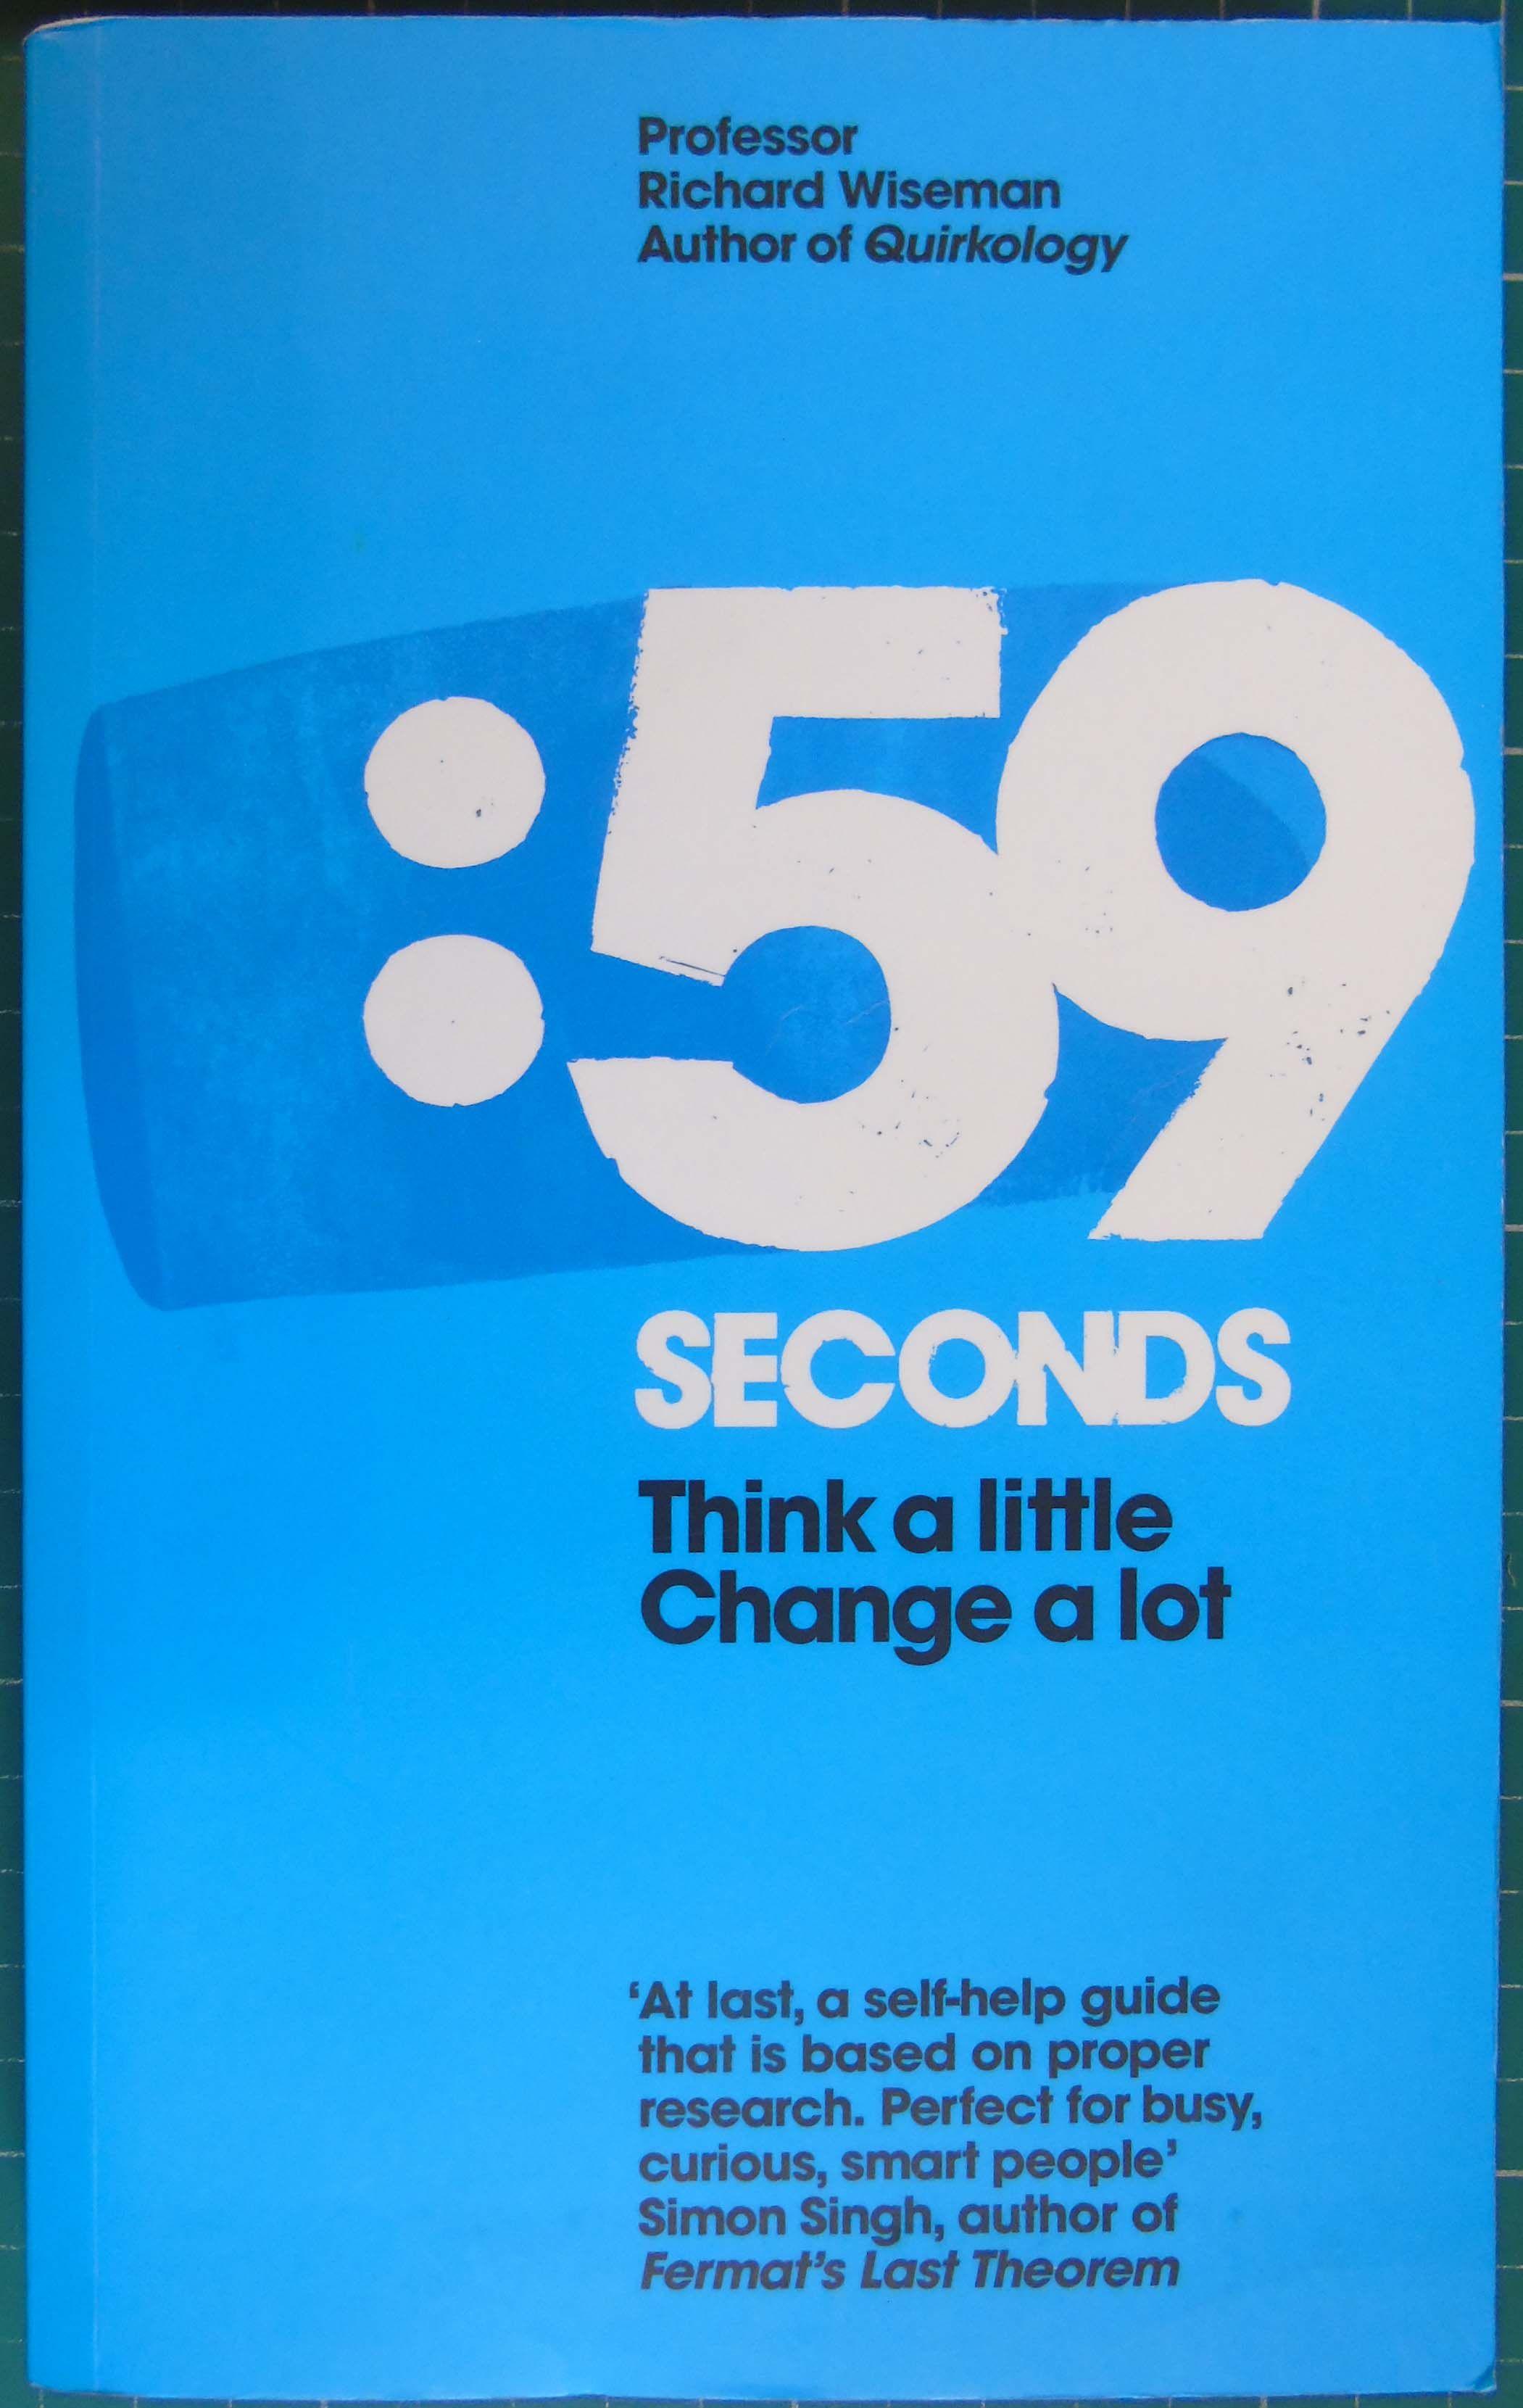 59 Seconds Richard Wiseman 9780230744295 - 59 seconds: think a little, change a lot